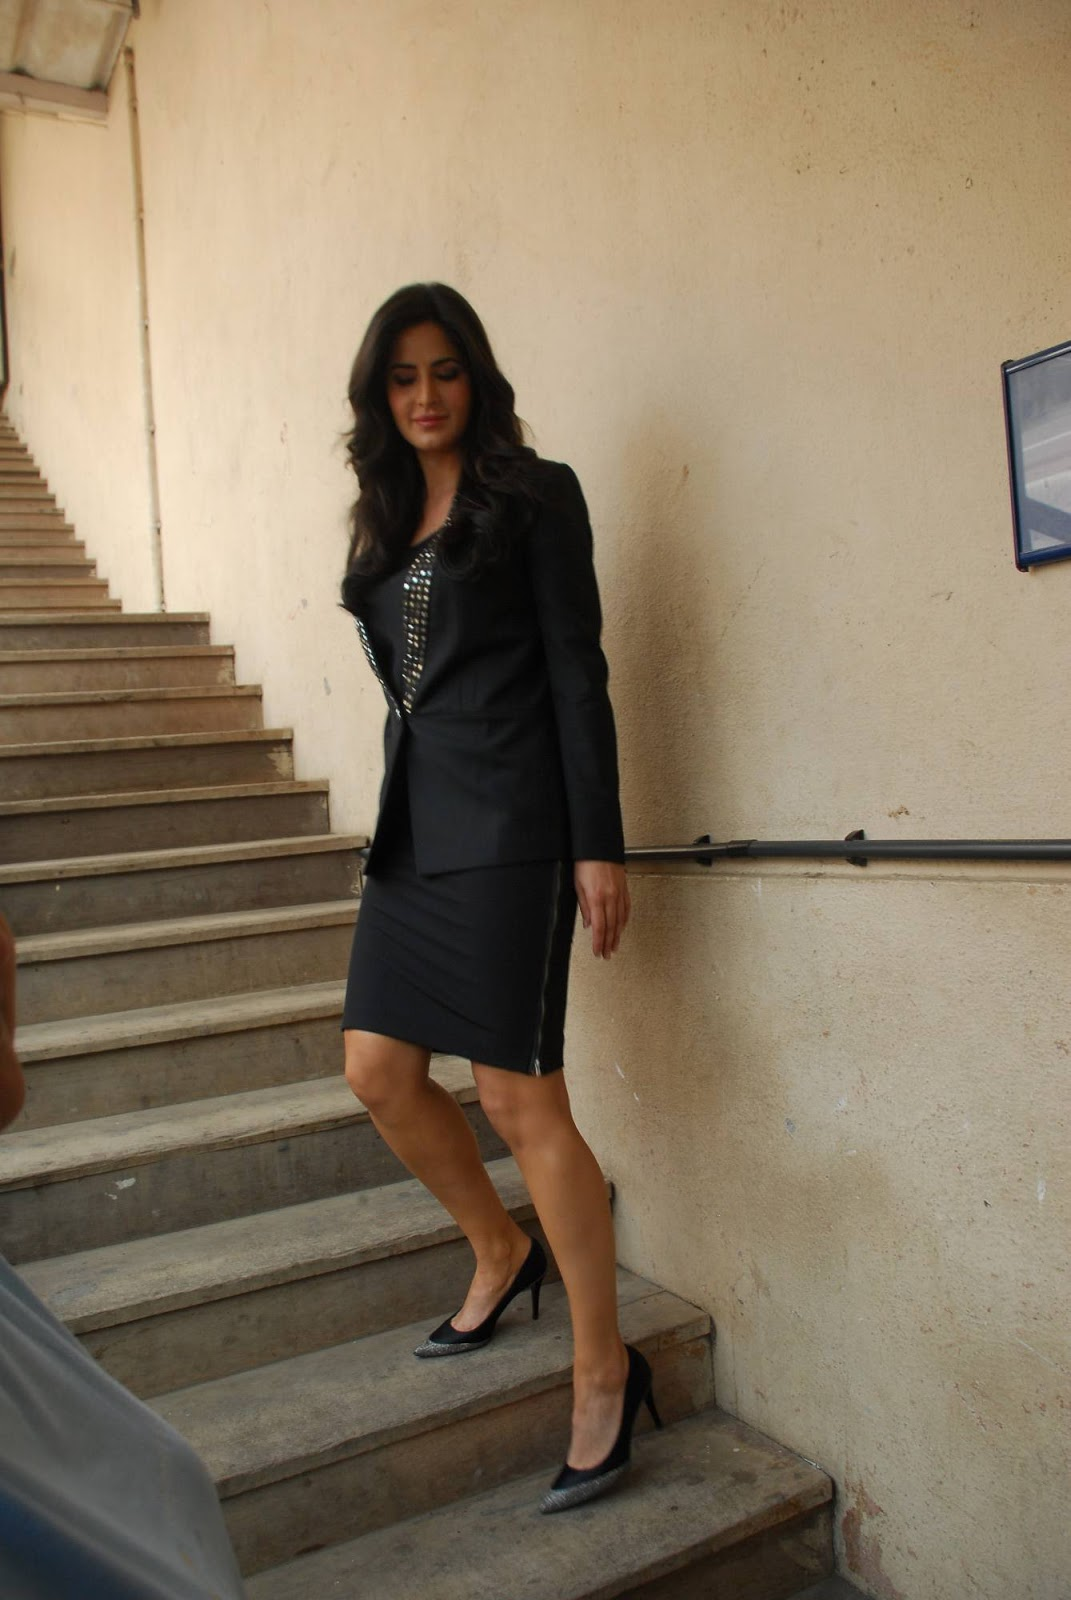 Katrina Kaif Latest Stills In Hot Black Dress - Kollywood ...